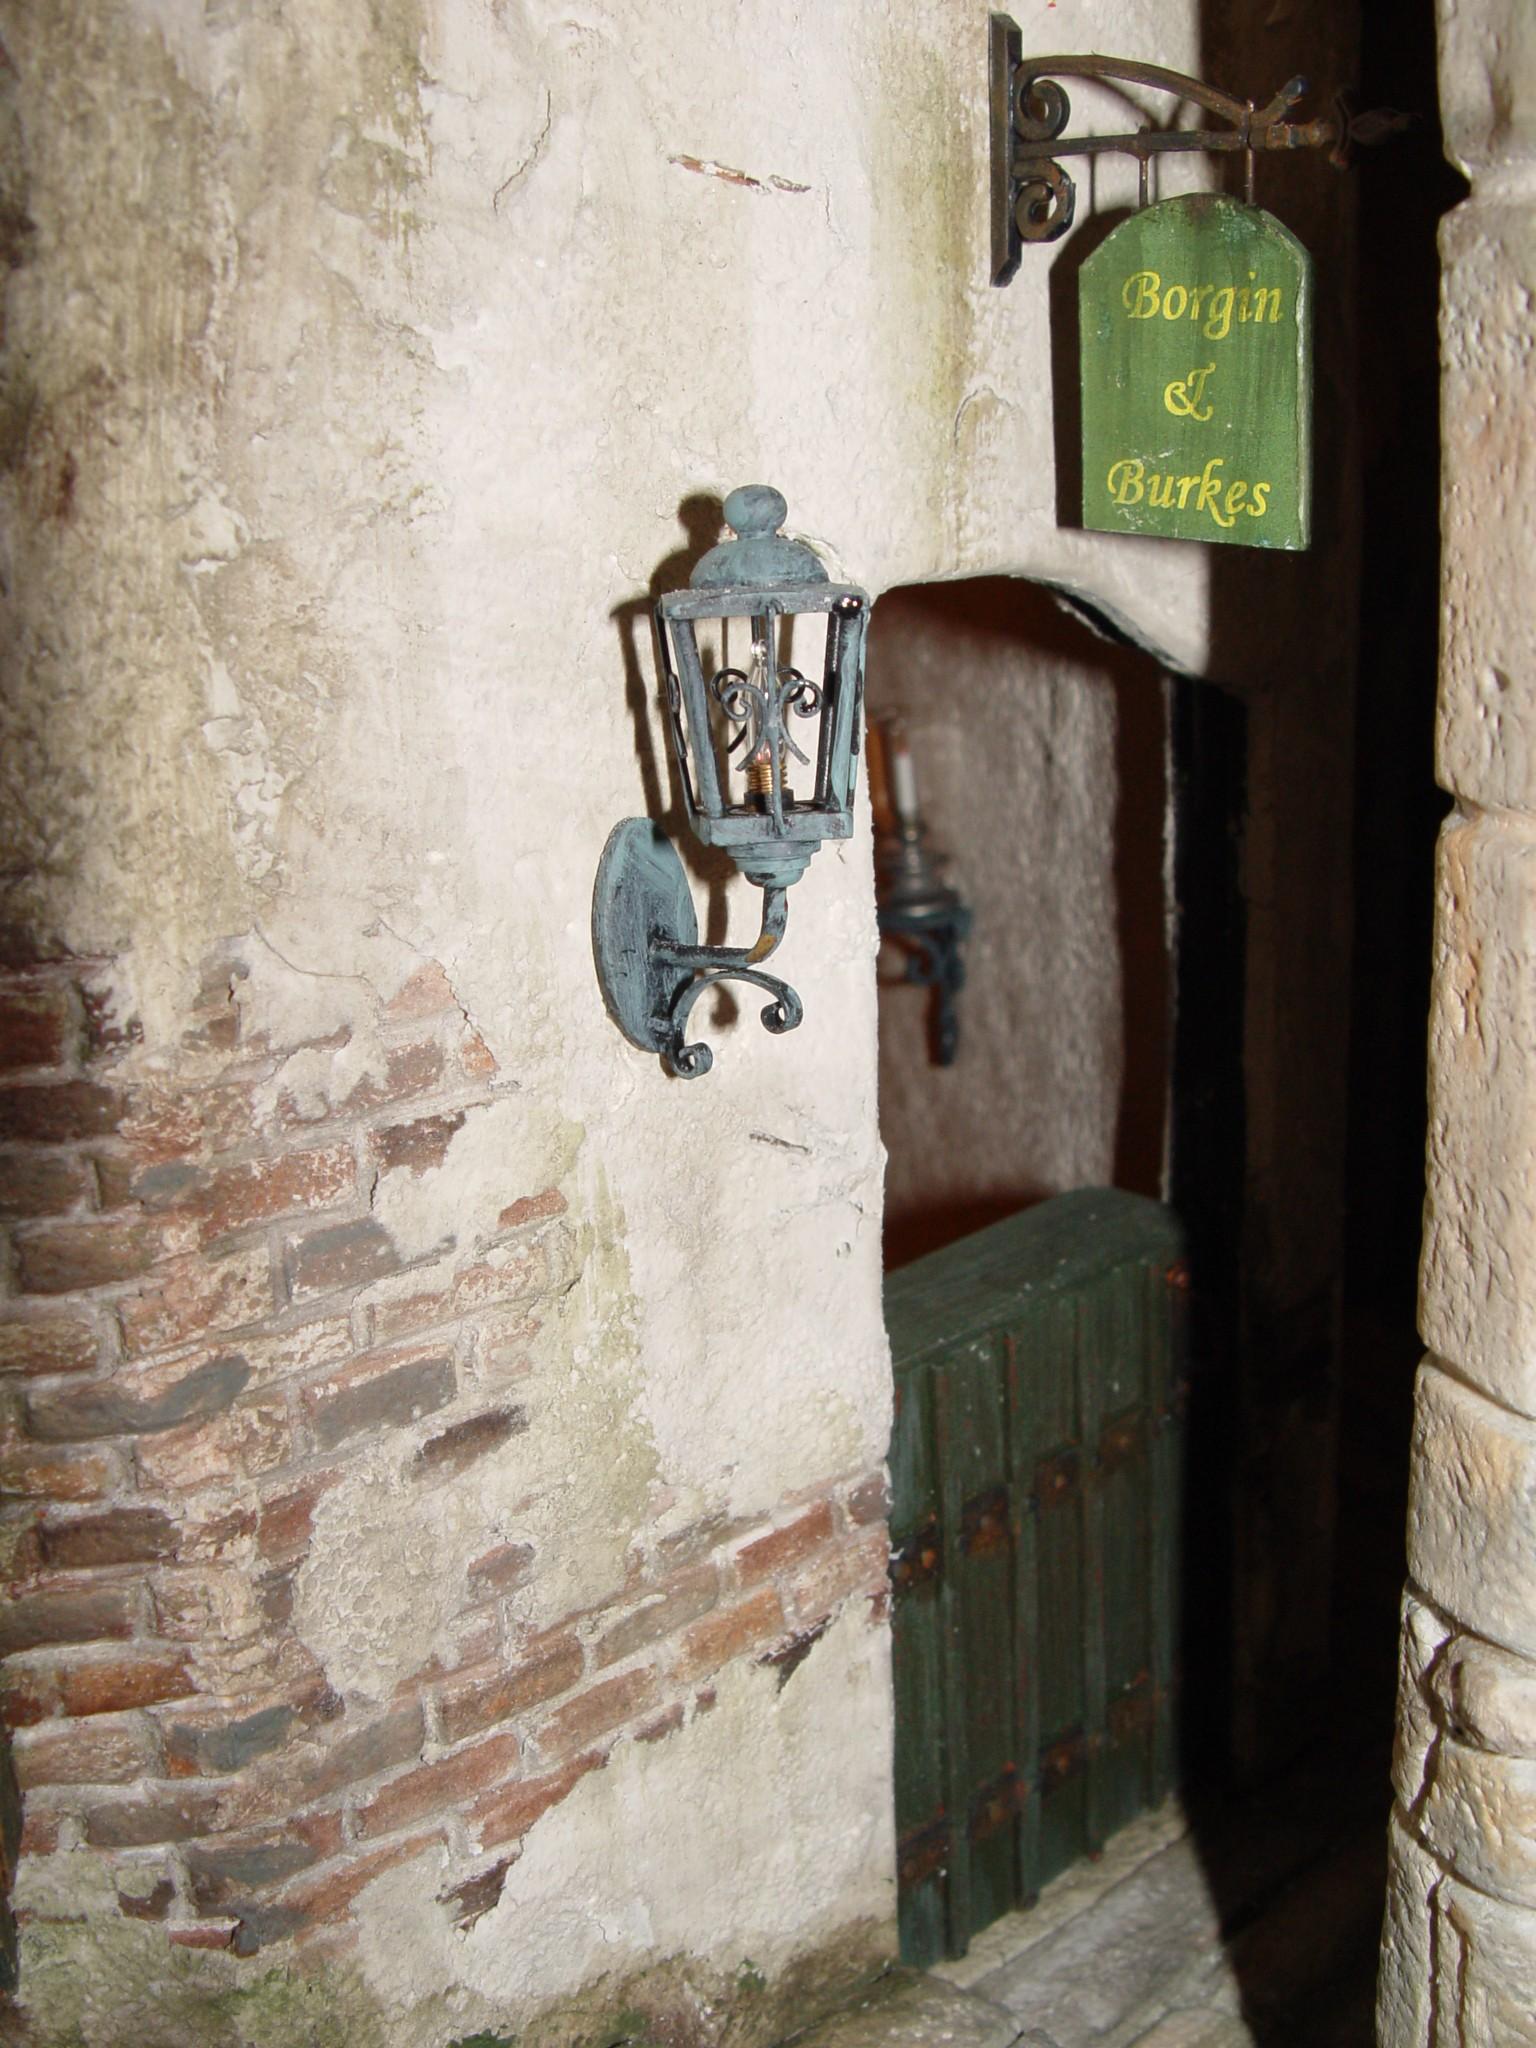 Borgin & Burkes Entryway